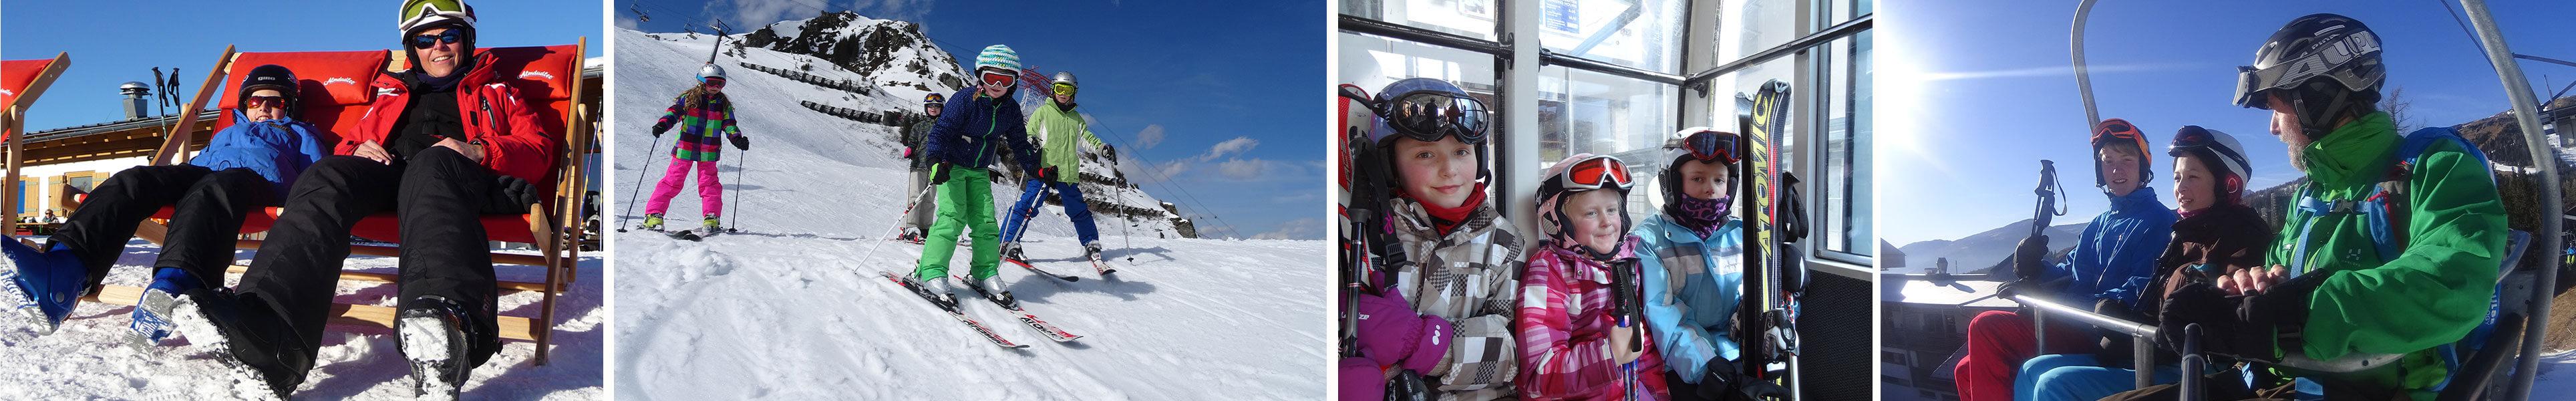 Szenen aus dem Skiurlaub